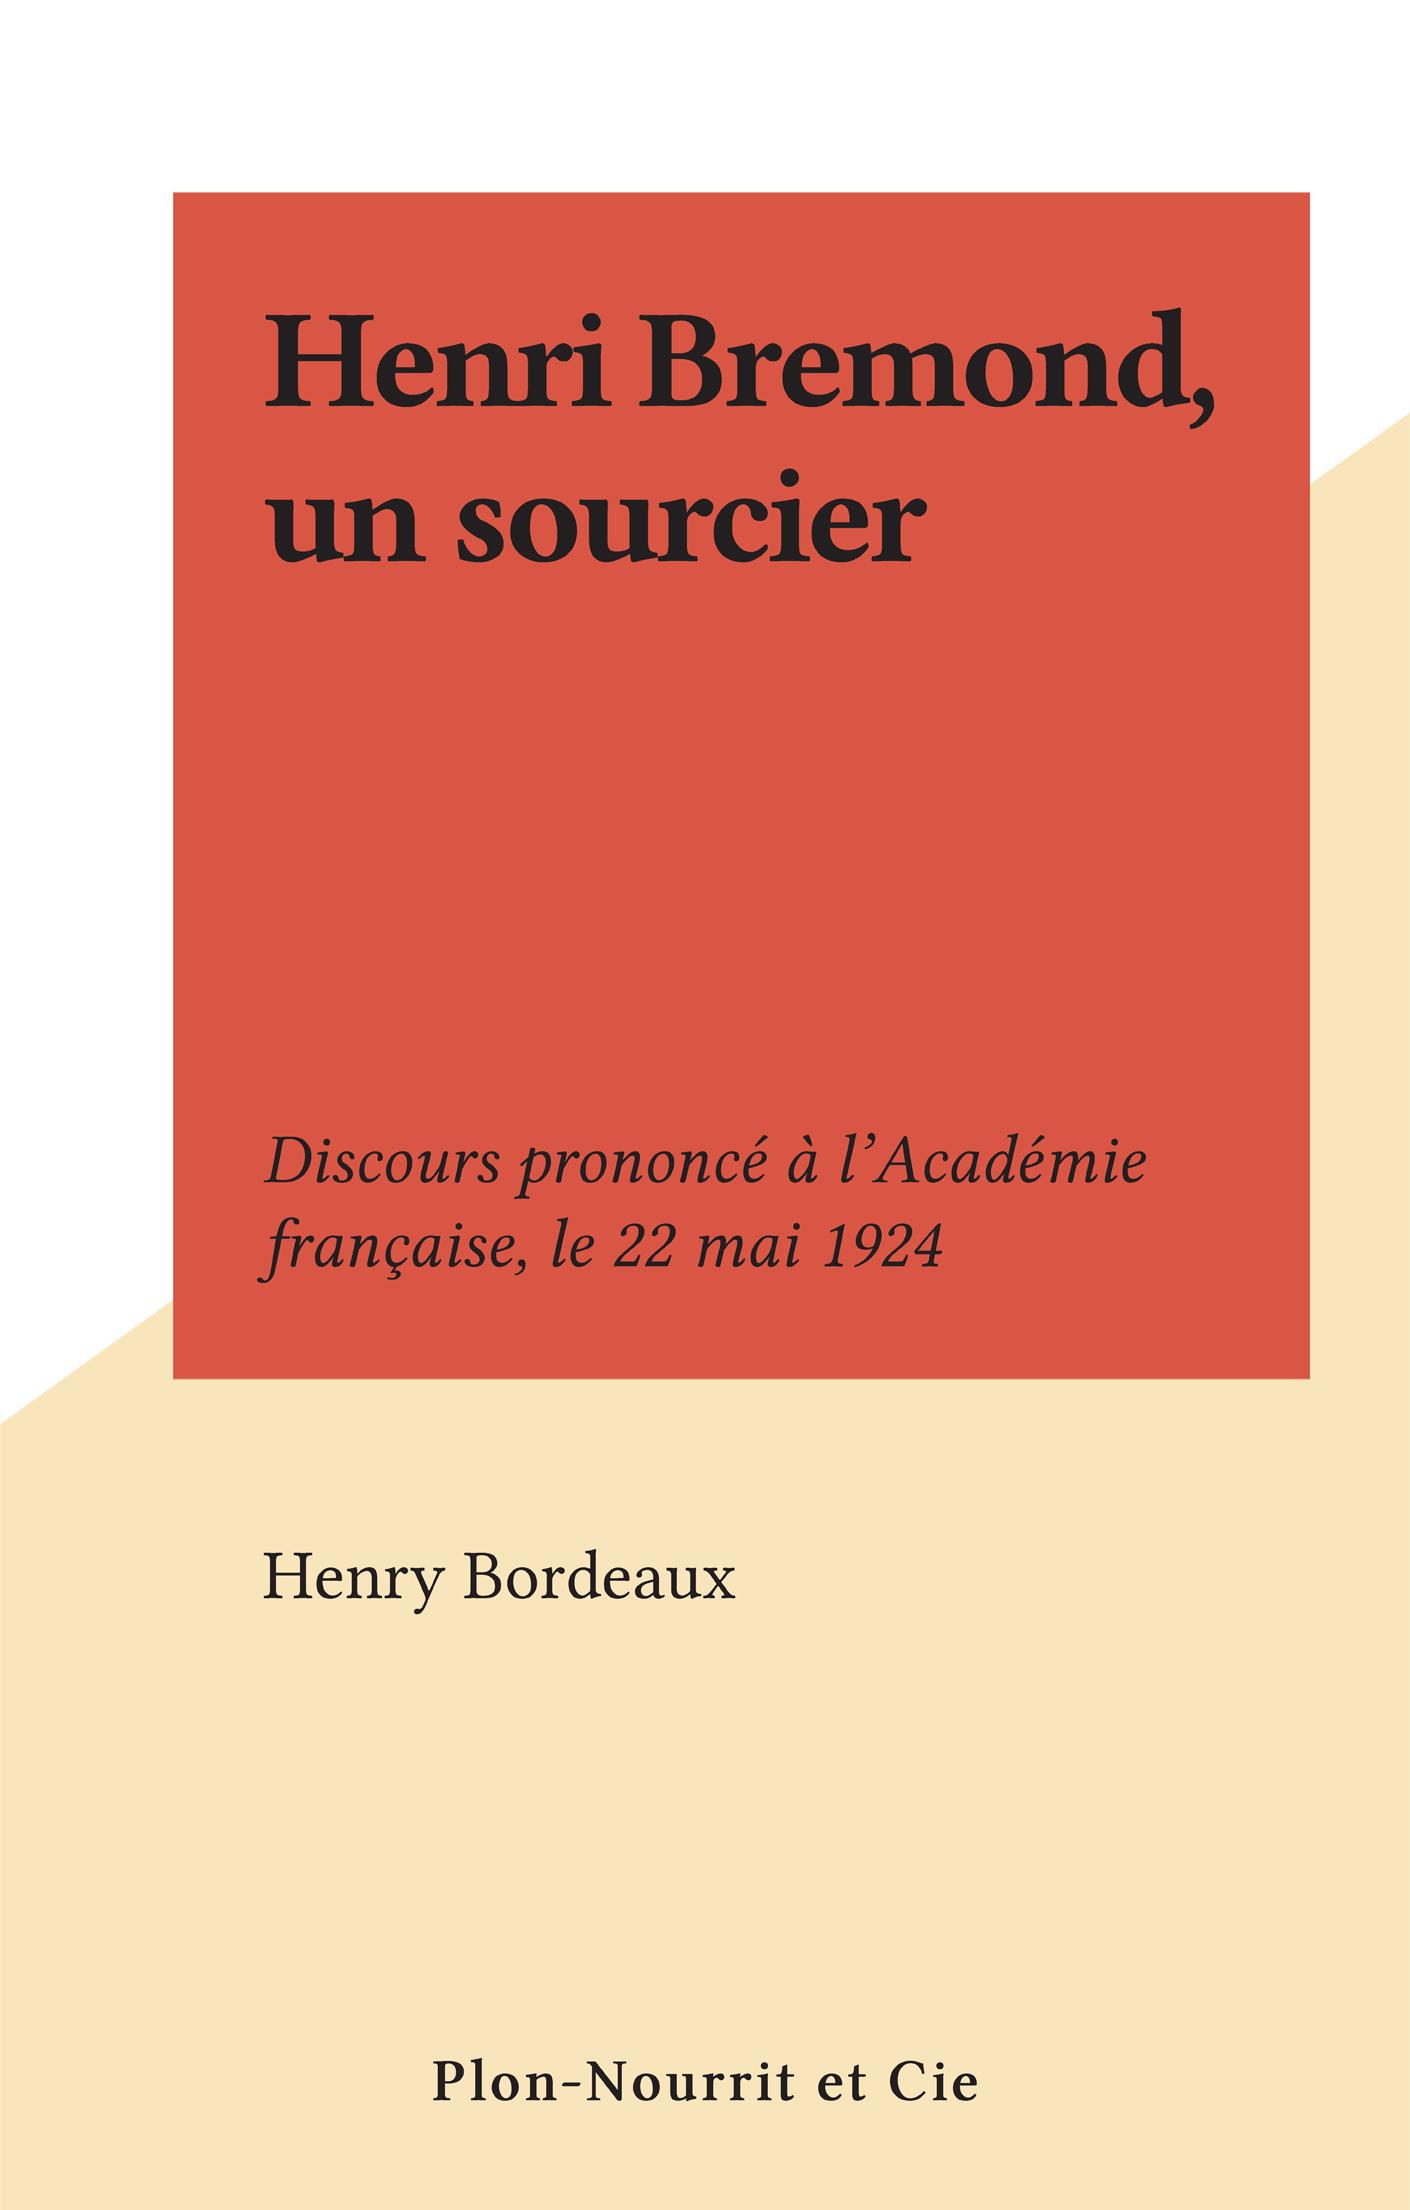 Henri Bremond, un sourcier